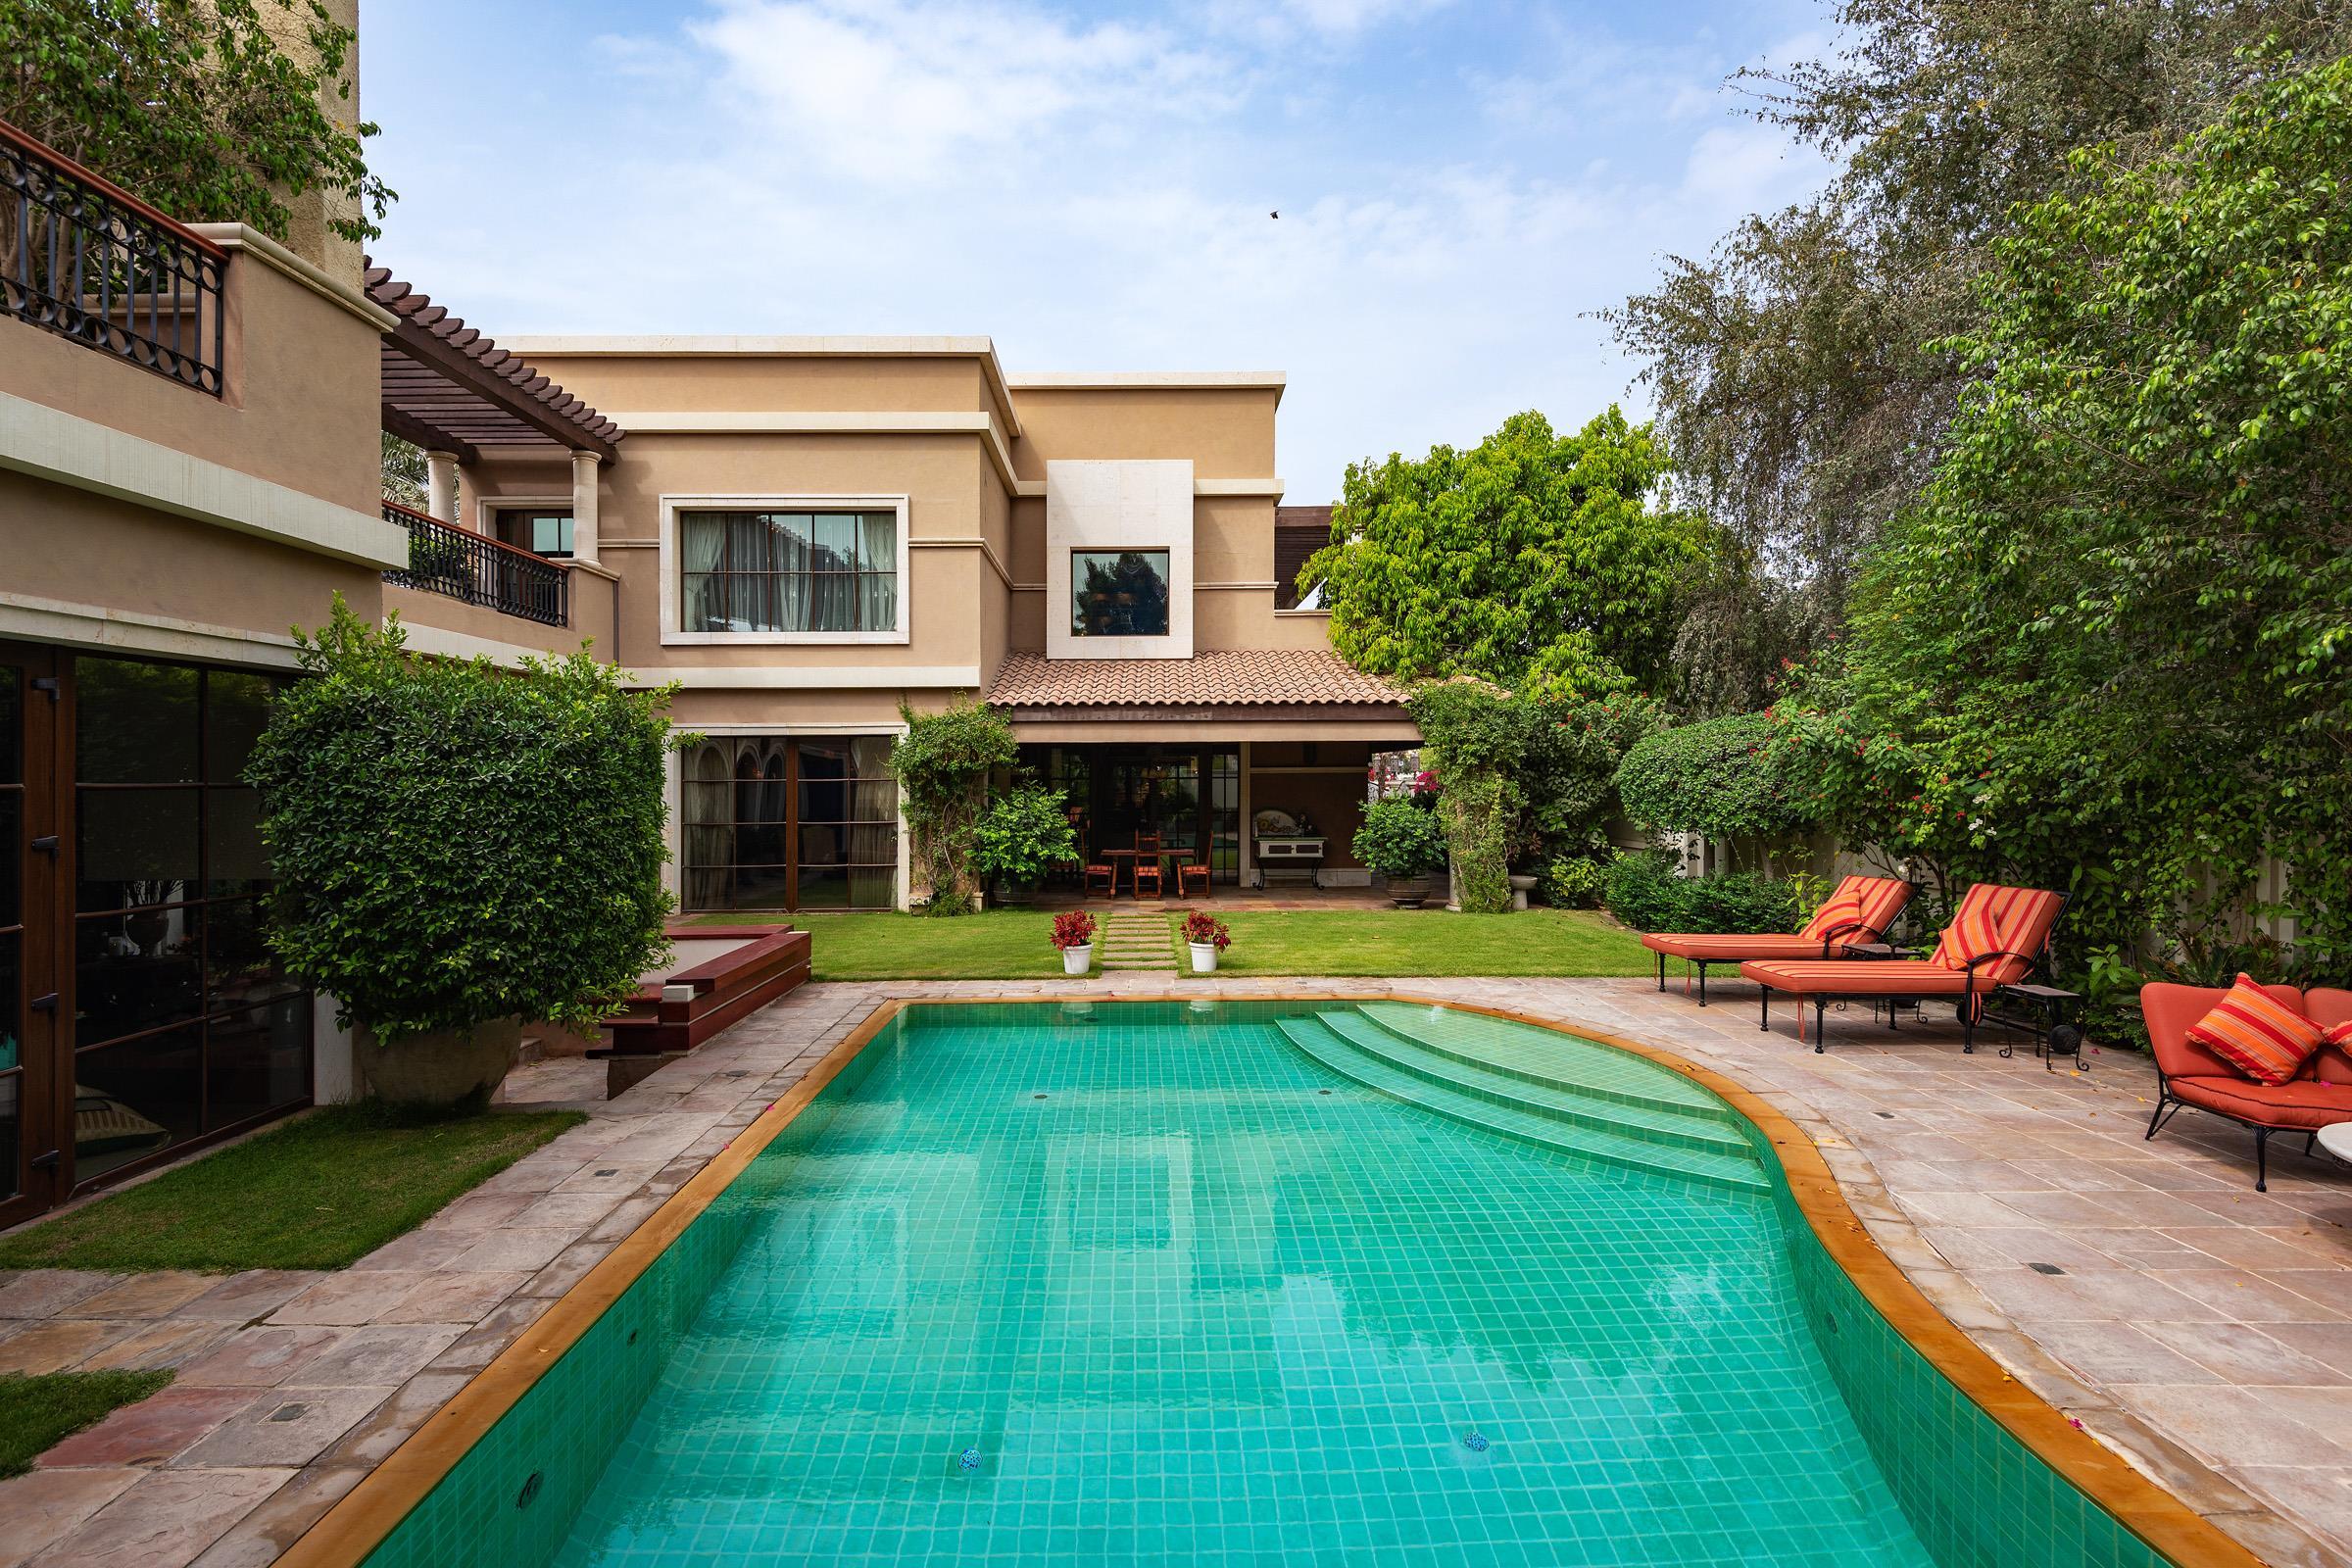 Exclusive Toscana Villa in Jumeirah